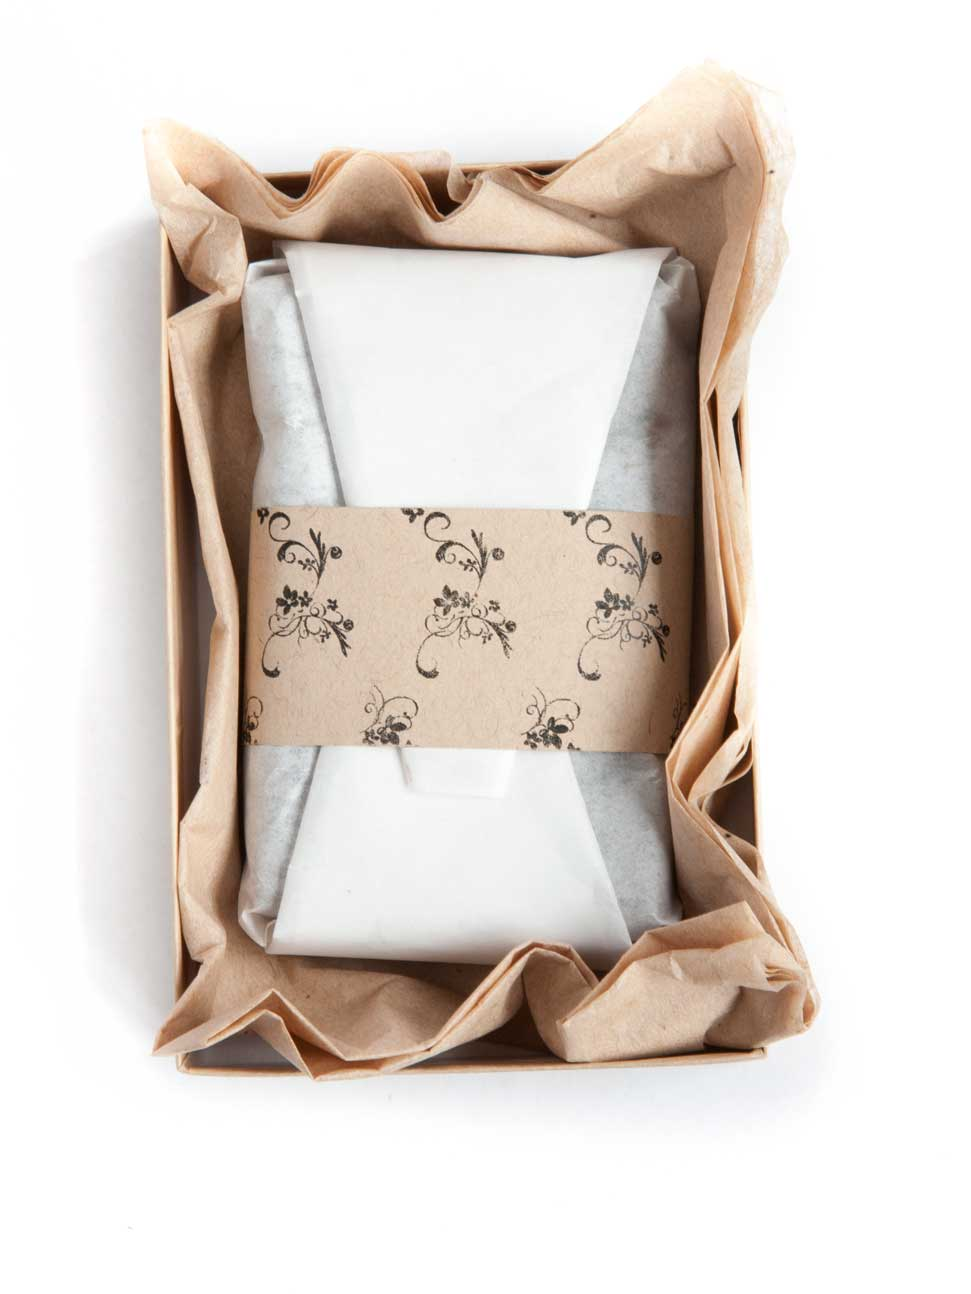 inside-box-with-sleeve.jpg